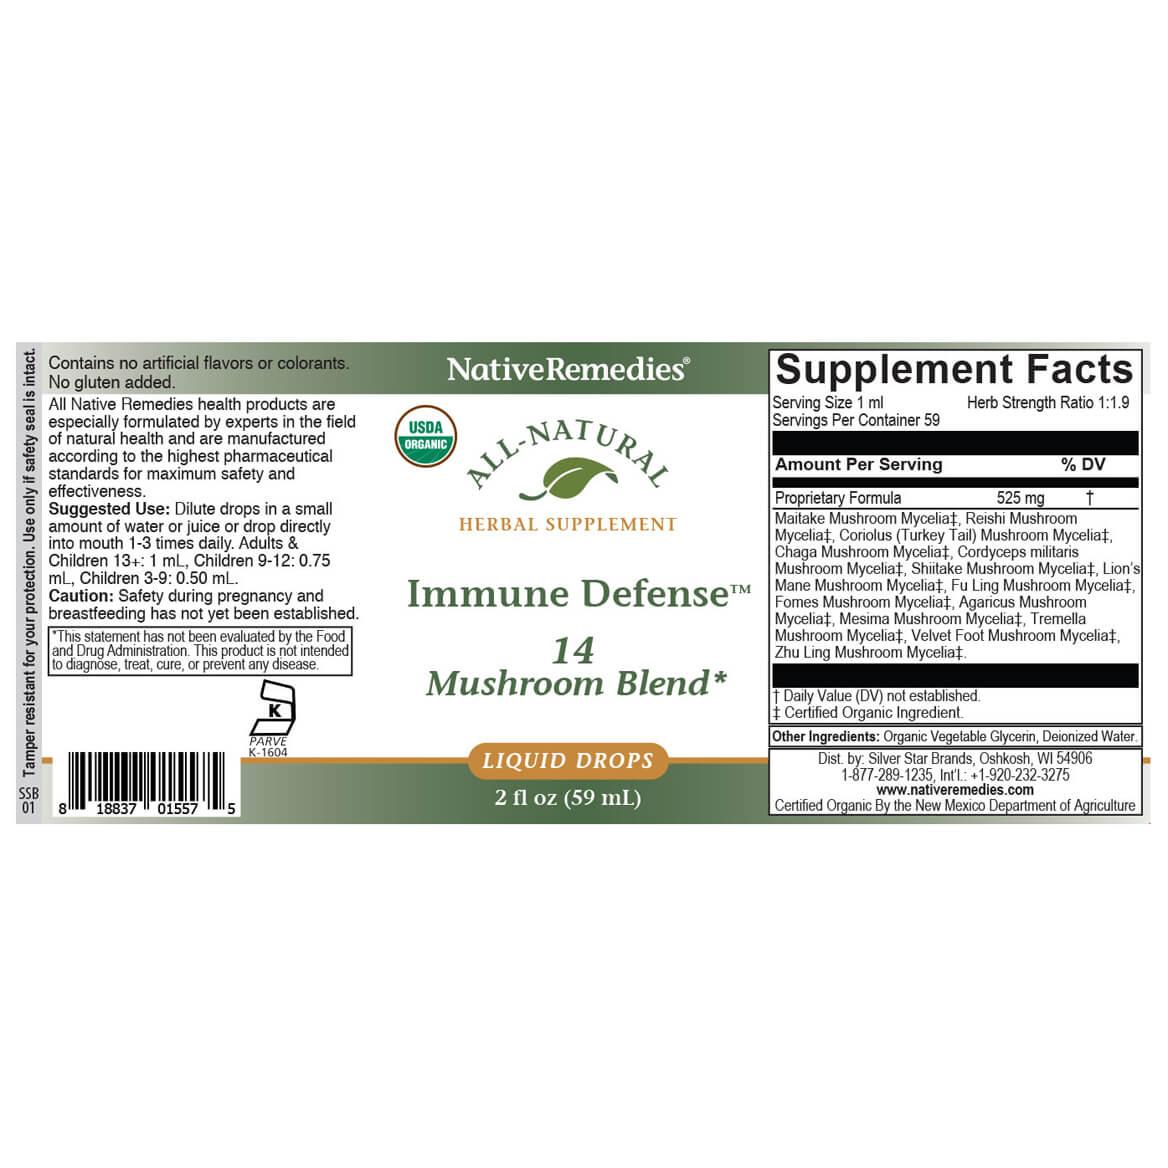 NativeRemedies® Immune Defense - 14 Mushroom Blend-370986